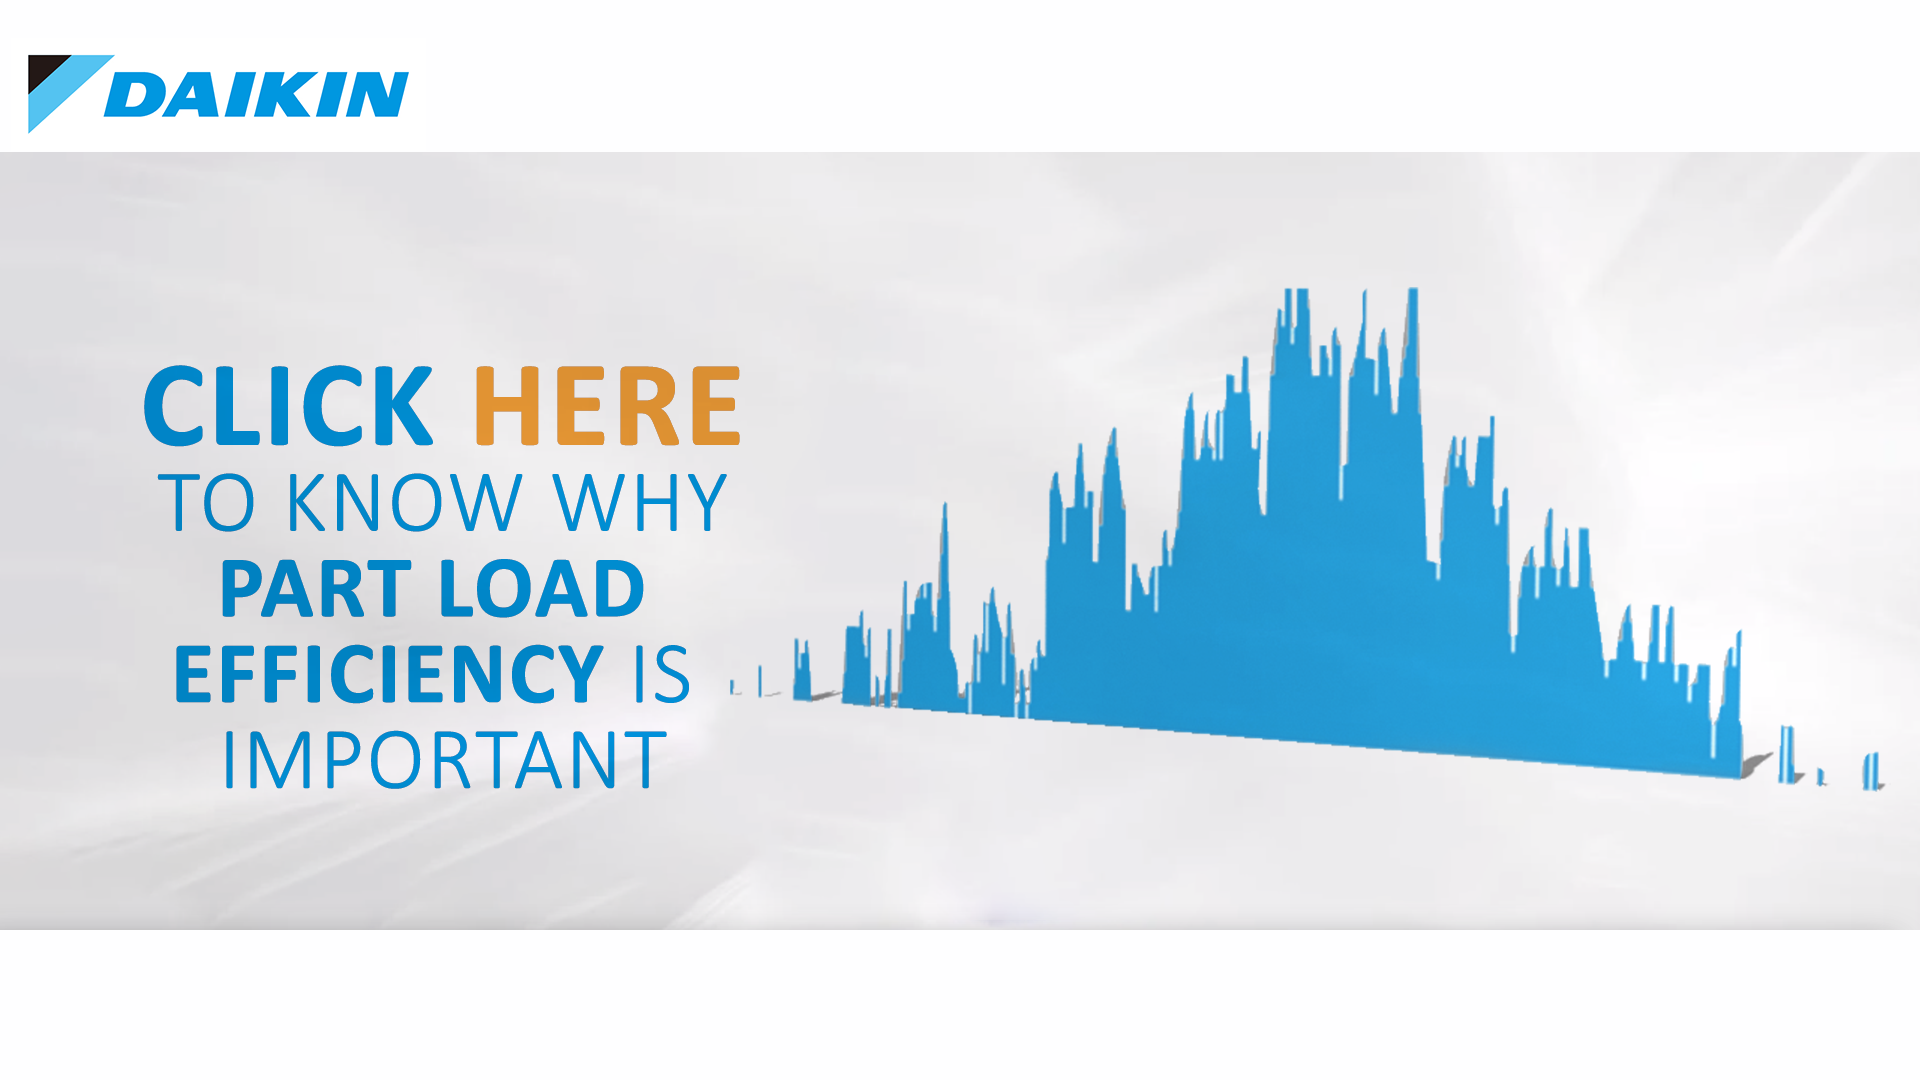 Part load efficiency